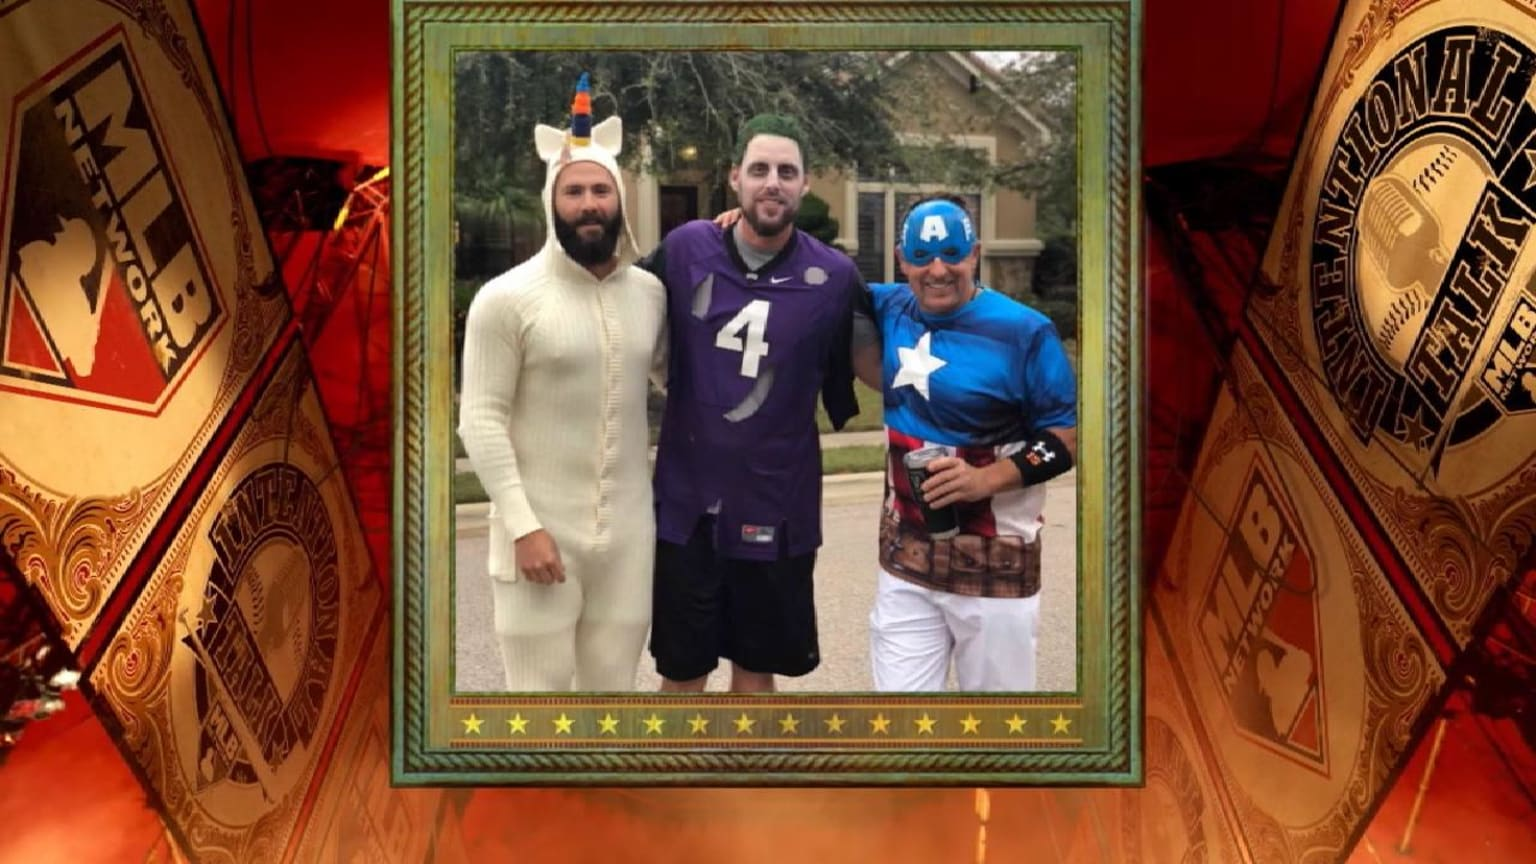 Mlb Players Halloween Costumes 11 01 2018 Mlb Com